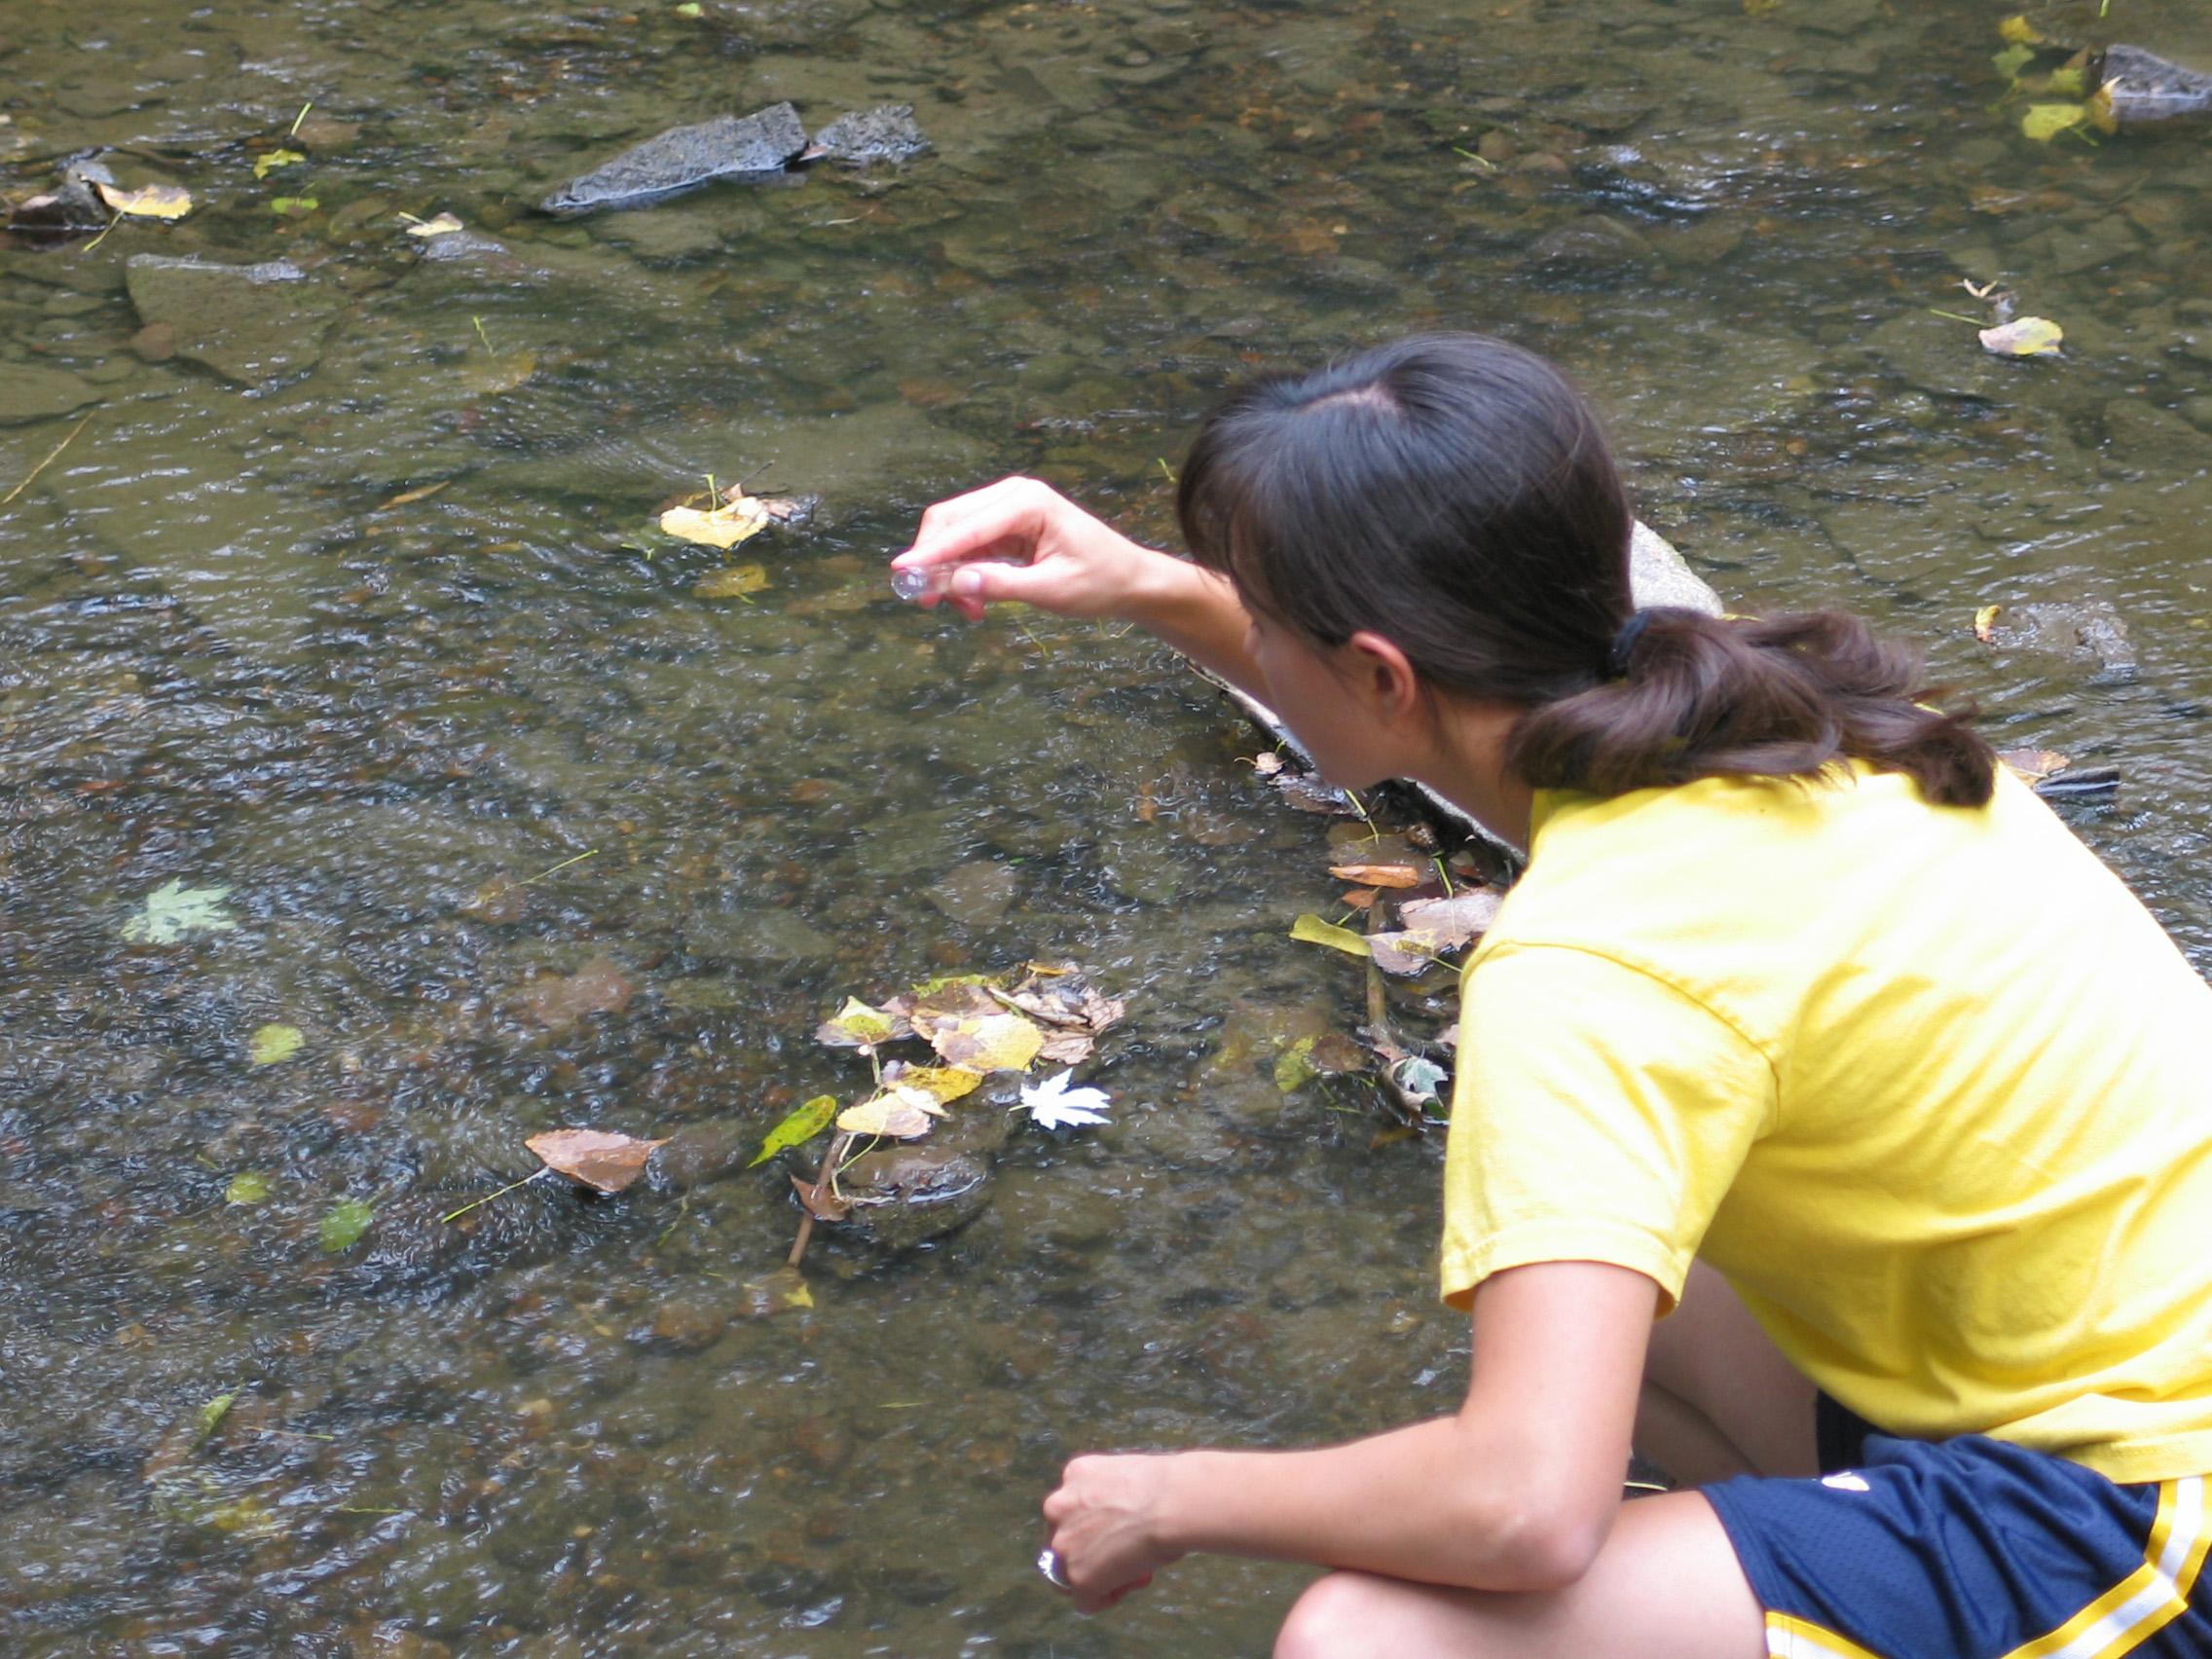 Environmental Scientist sampling water.